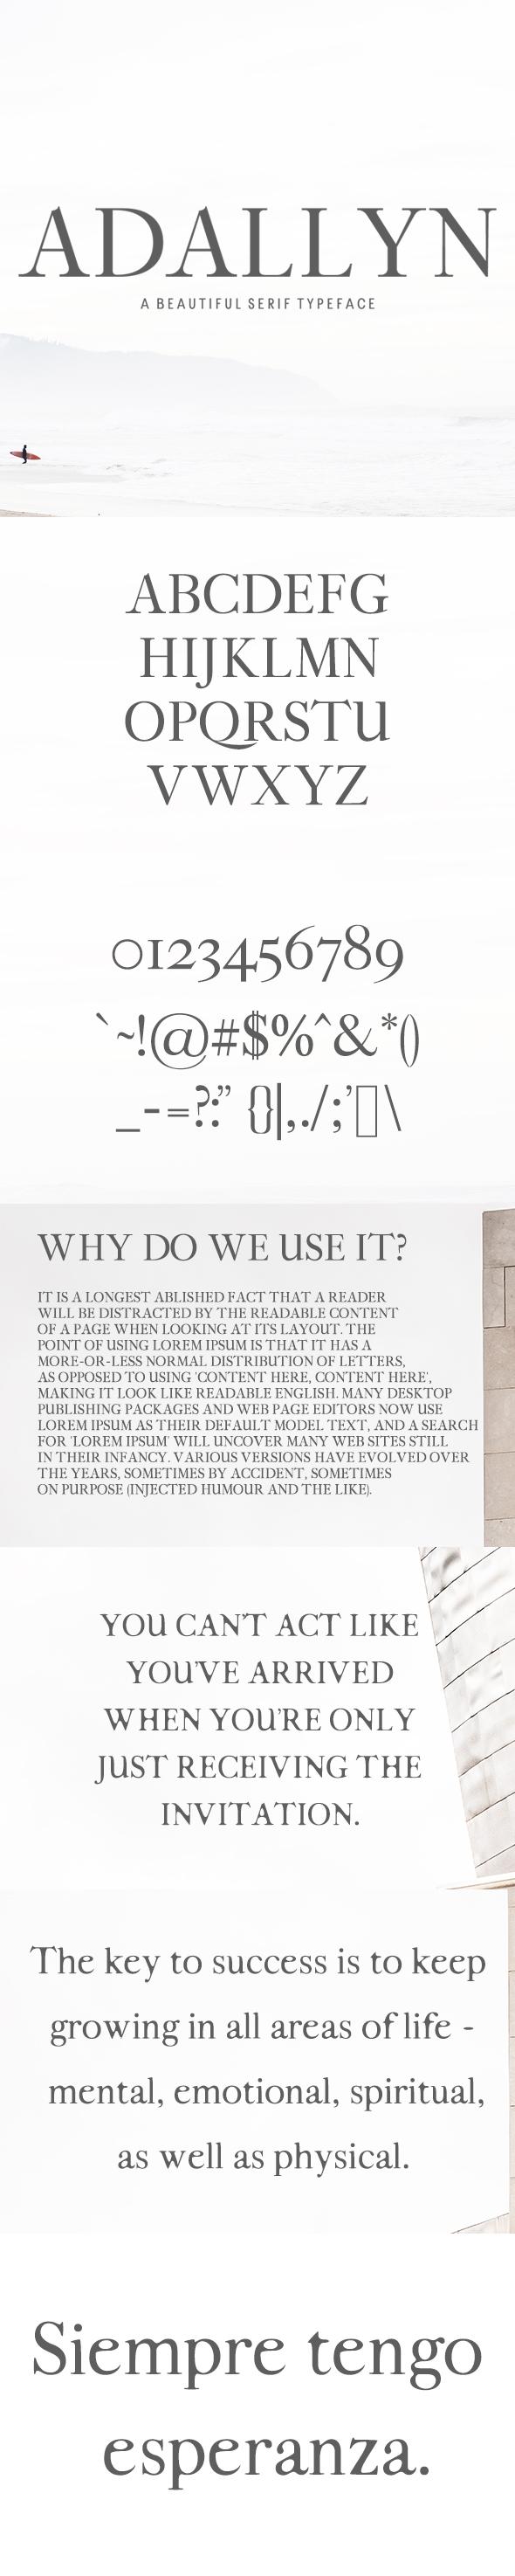 Adallyn Serif Font Family Pack - Serif Fonts